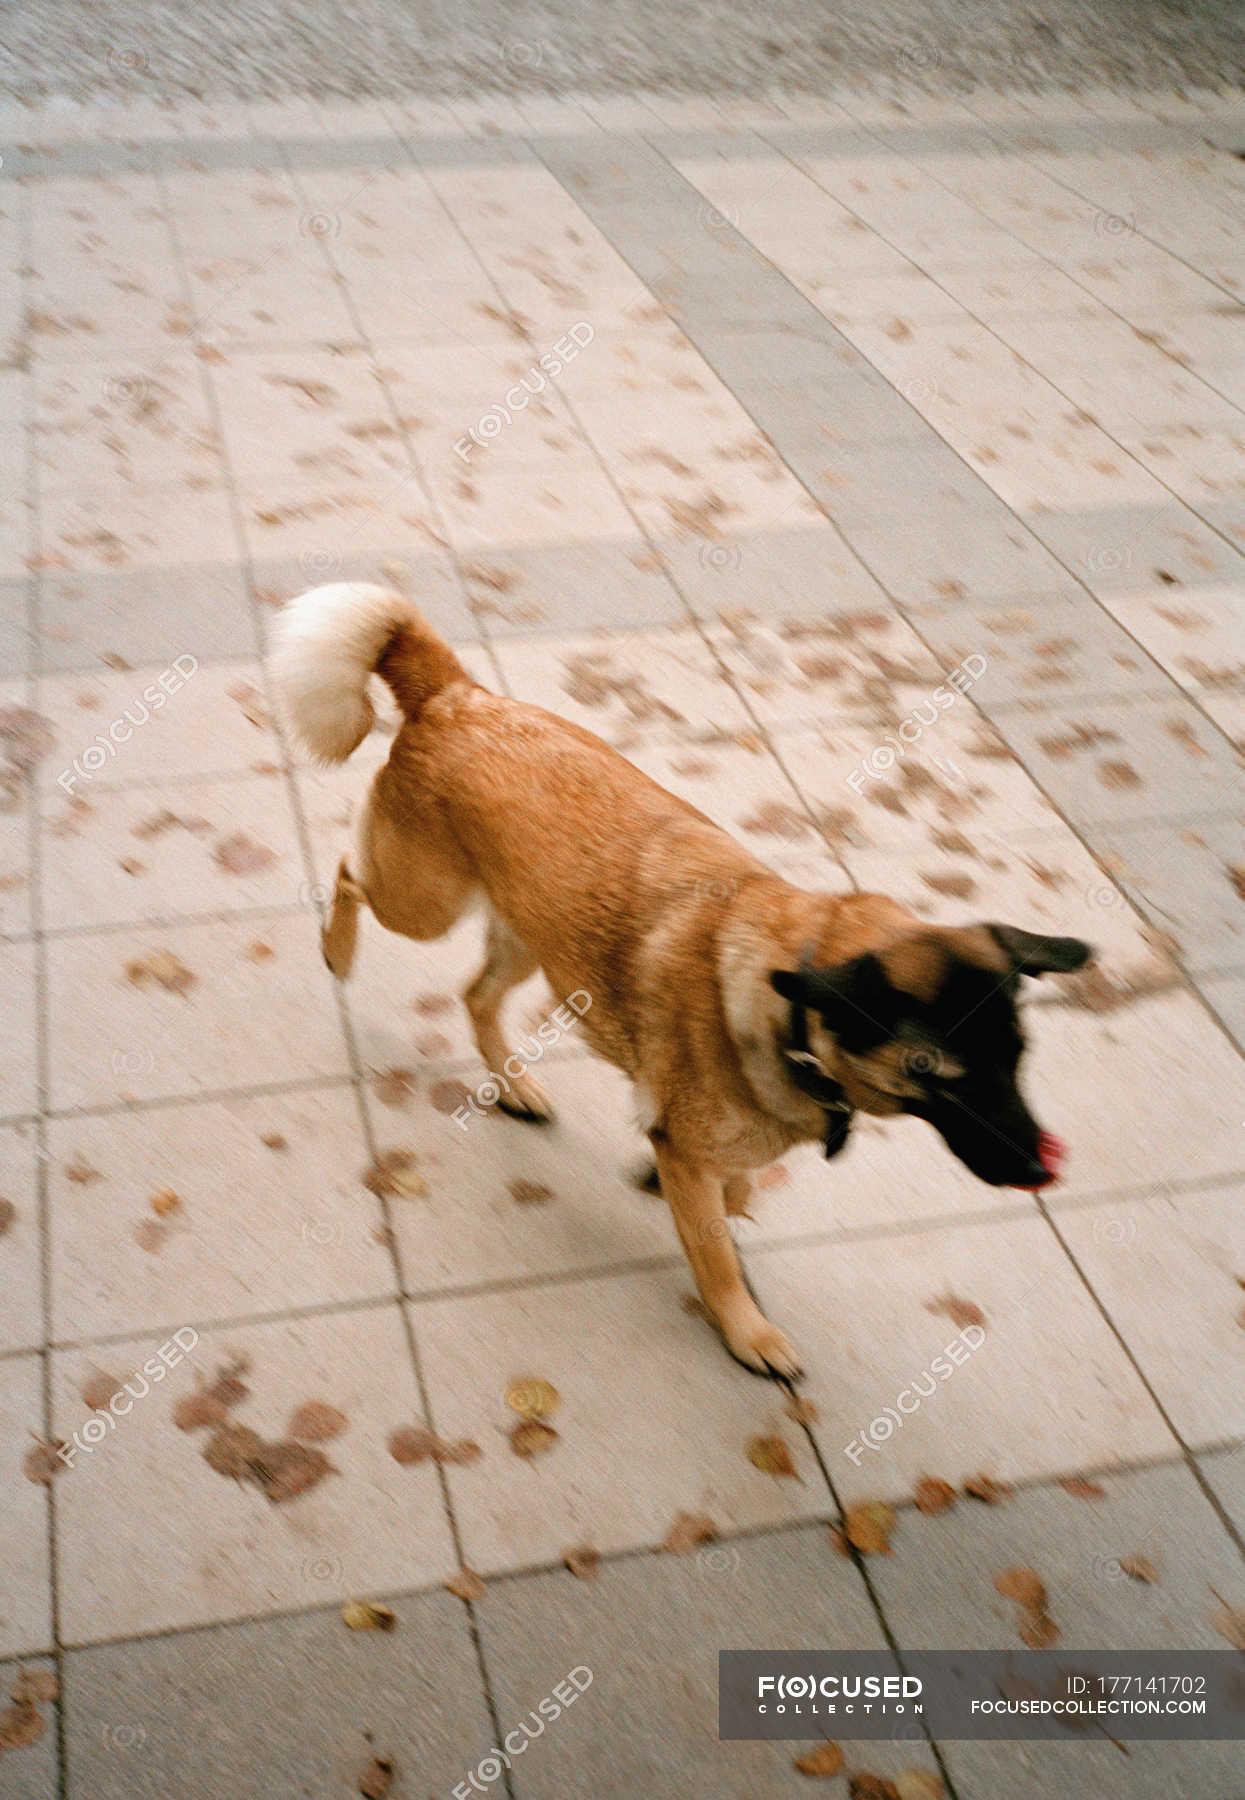 Dog licking nose and walking at tiled